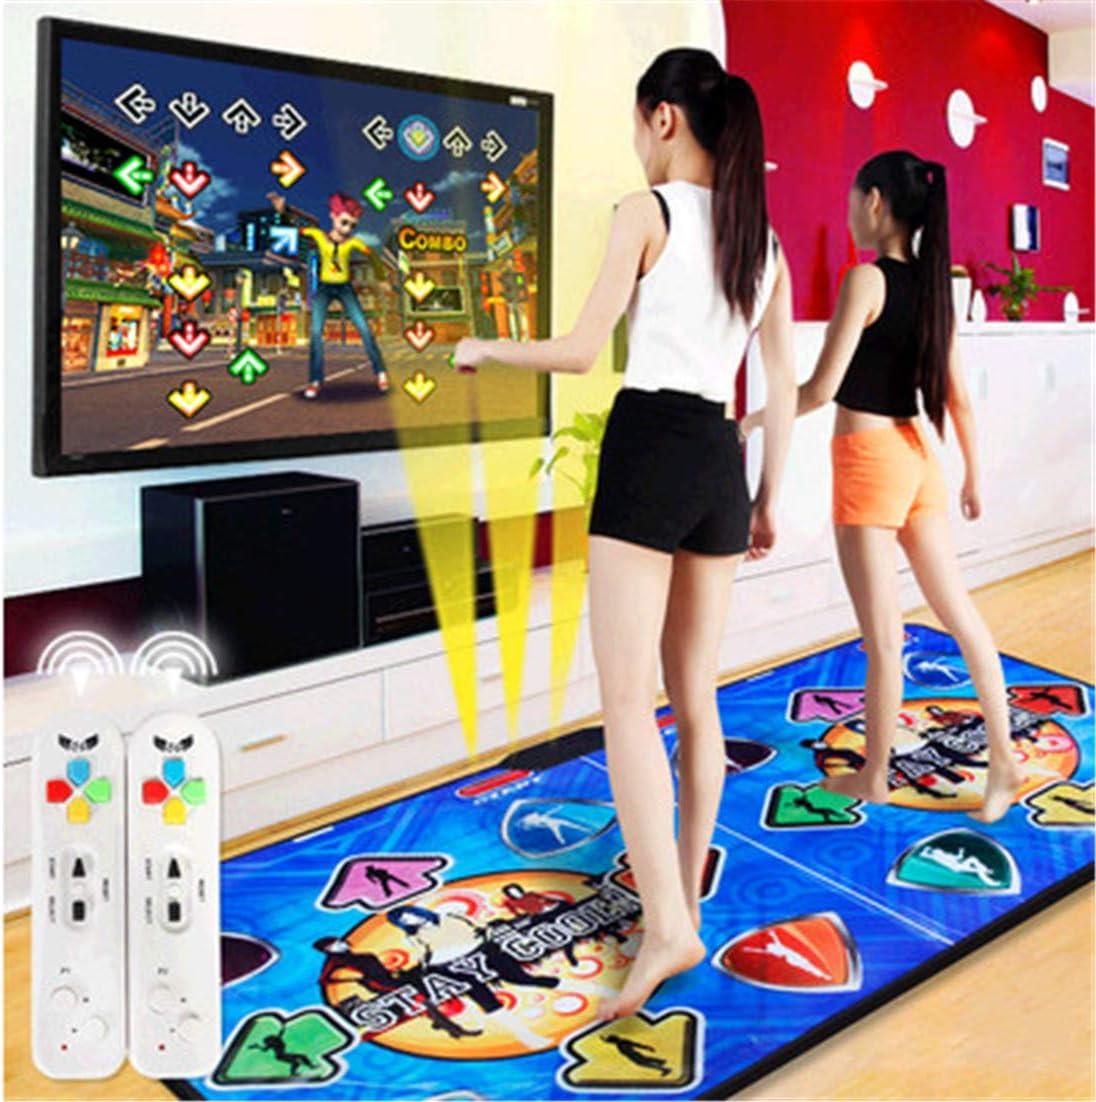 Skiout Wireless Double Dance Mats with Gamepad Dancing Blanket Dance Music Mixer Electronic Musical Play Mat for Adults//Children Tv Computer,B